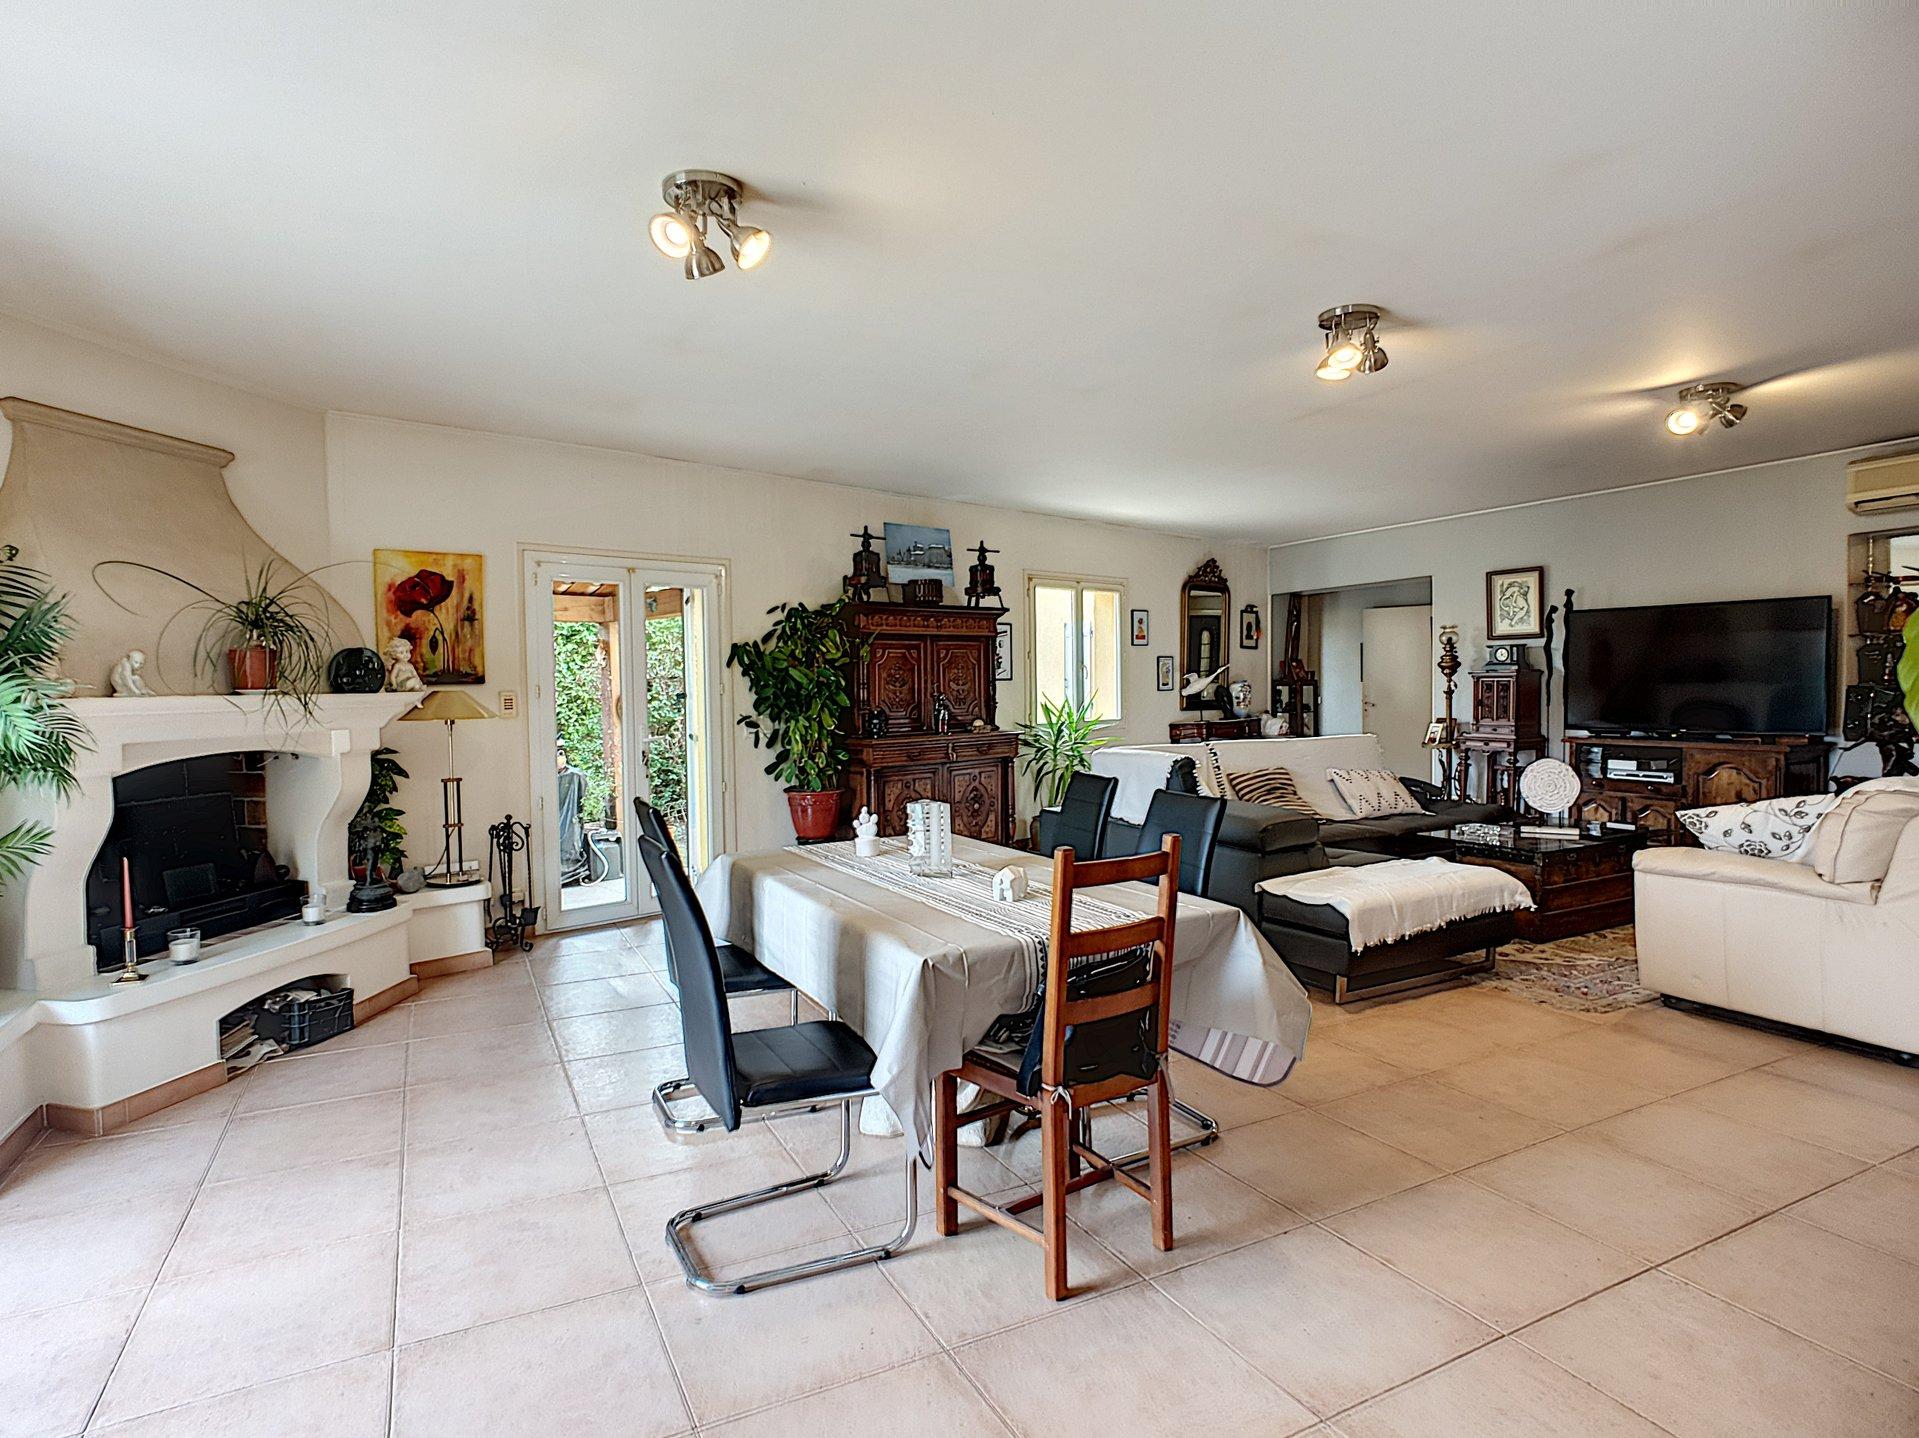 Vente villa plain pieds à Cabris